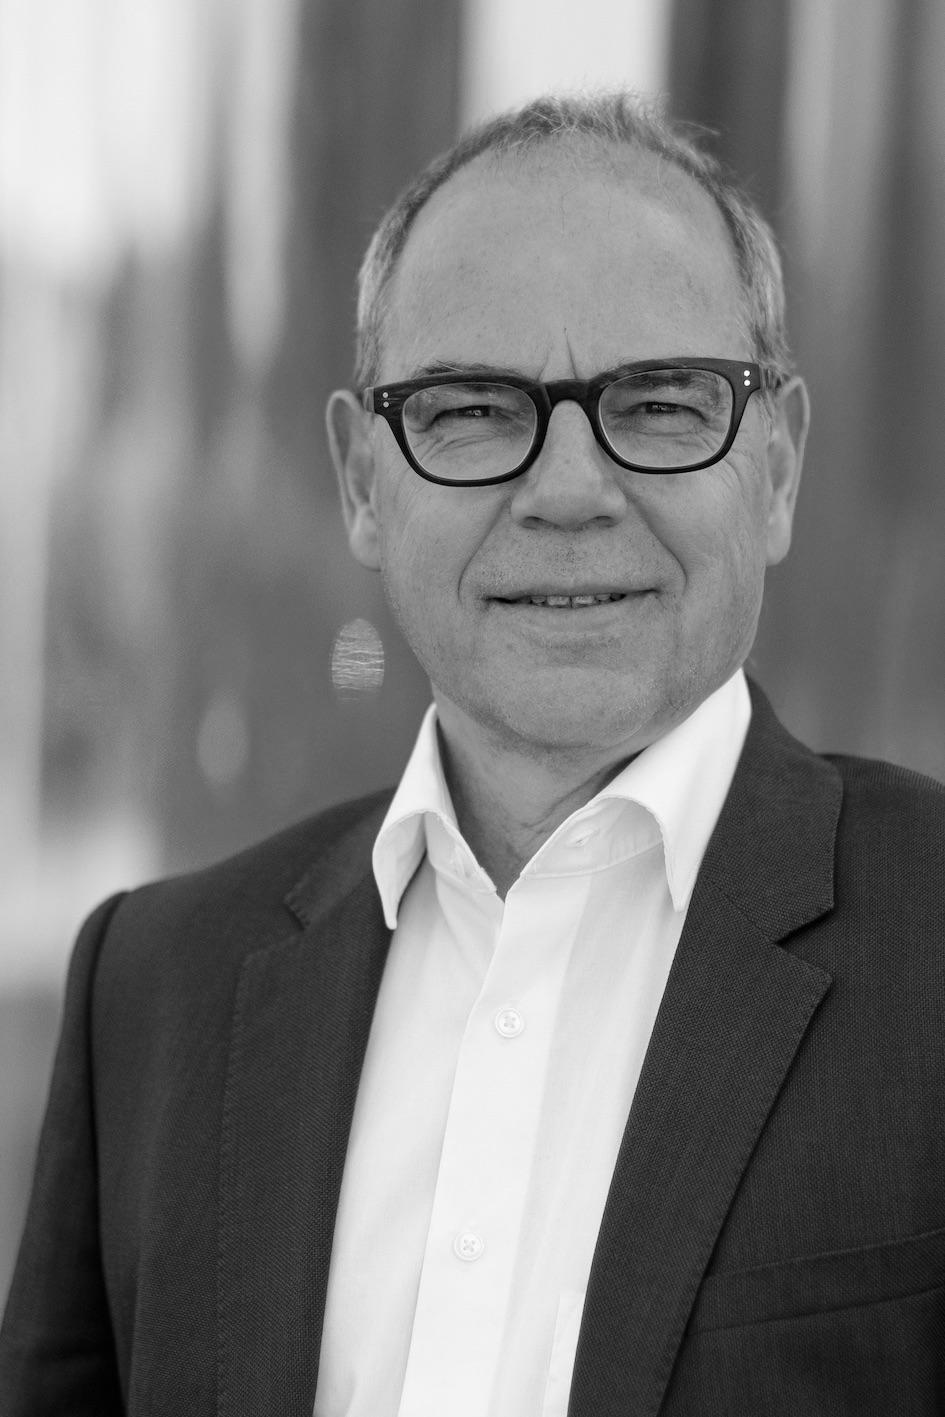 Dr. Uwe Nickel